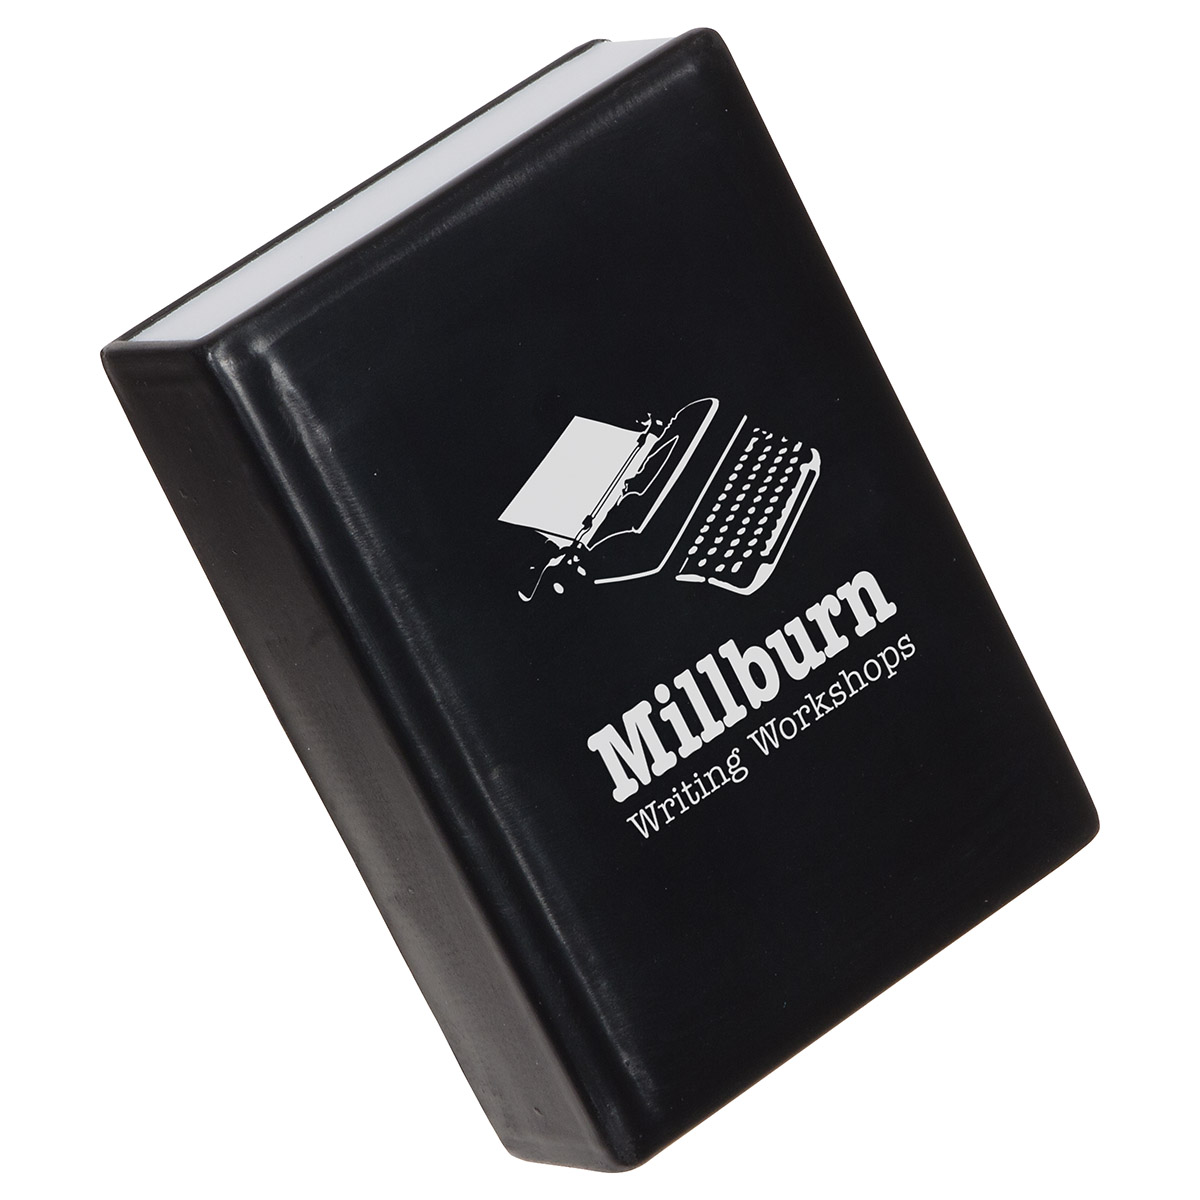 Book Stress Reliever, LED-BK18, 1 Colour Imprint